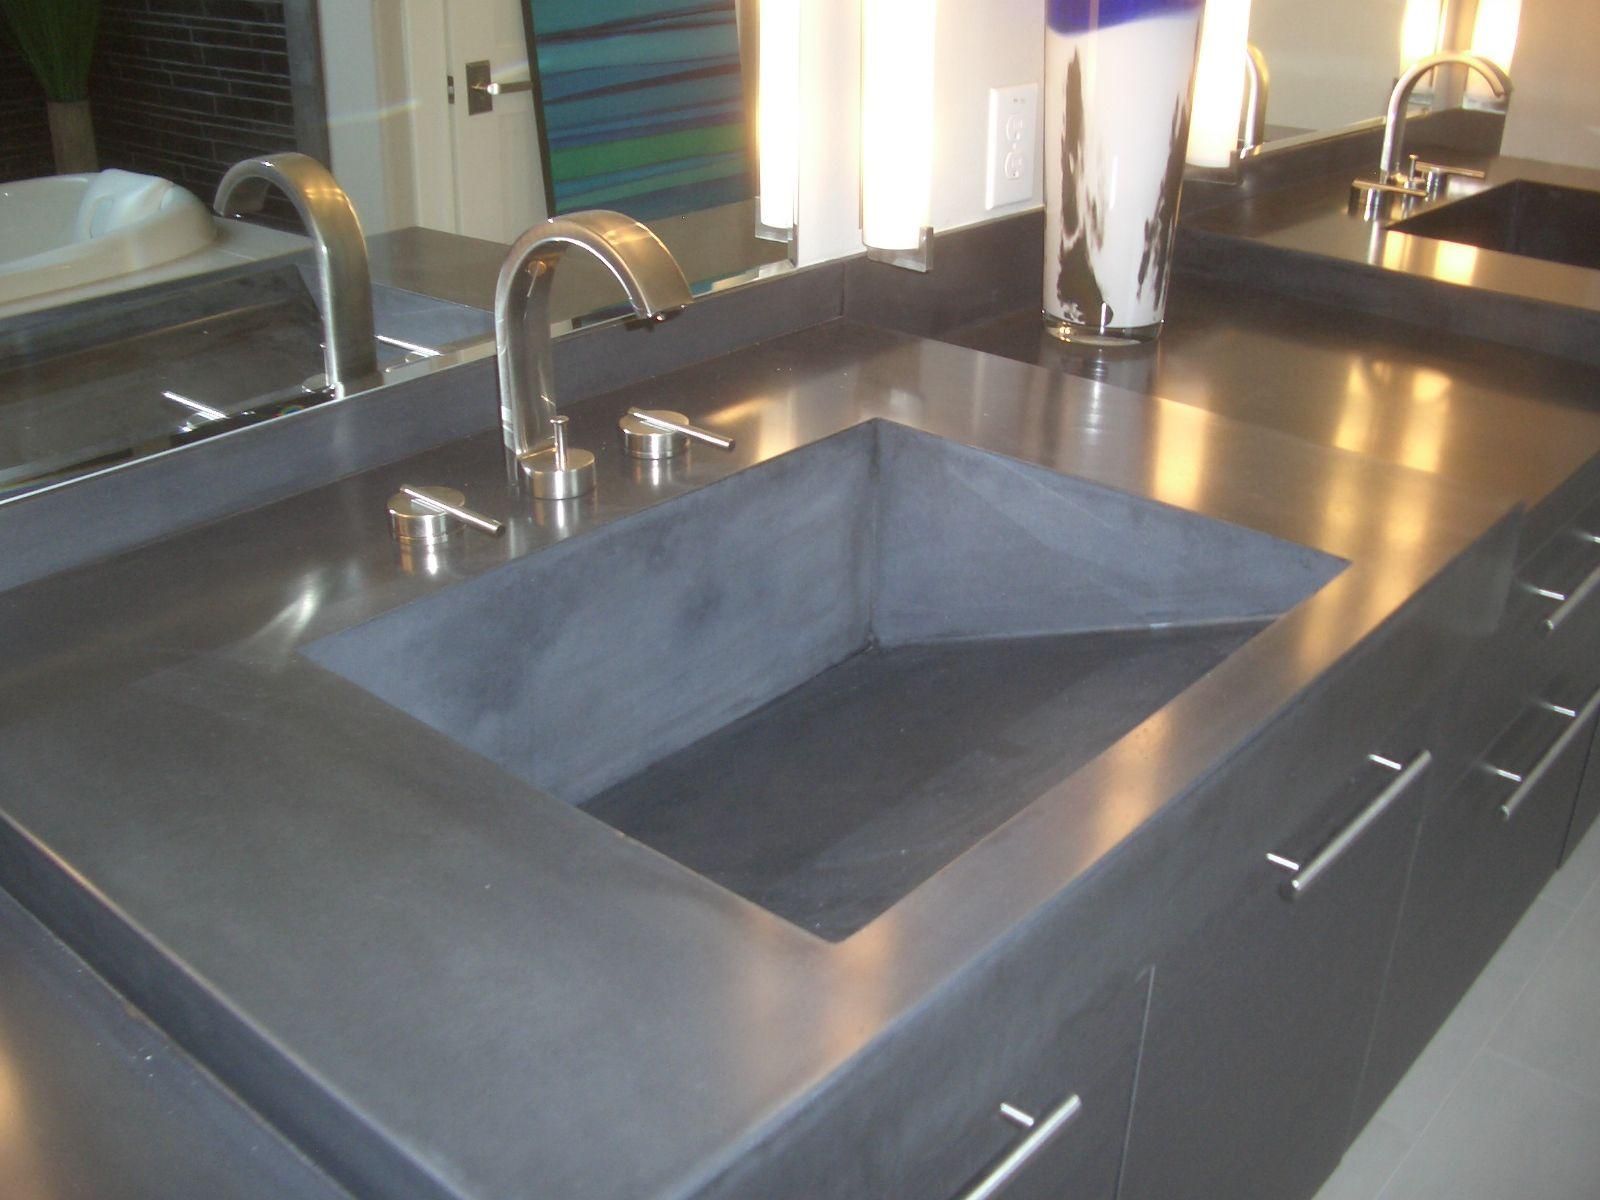 concrete countertop prices kitchen countertops prices Concrete Countertops Prices Bestcountertops